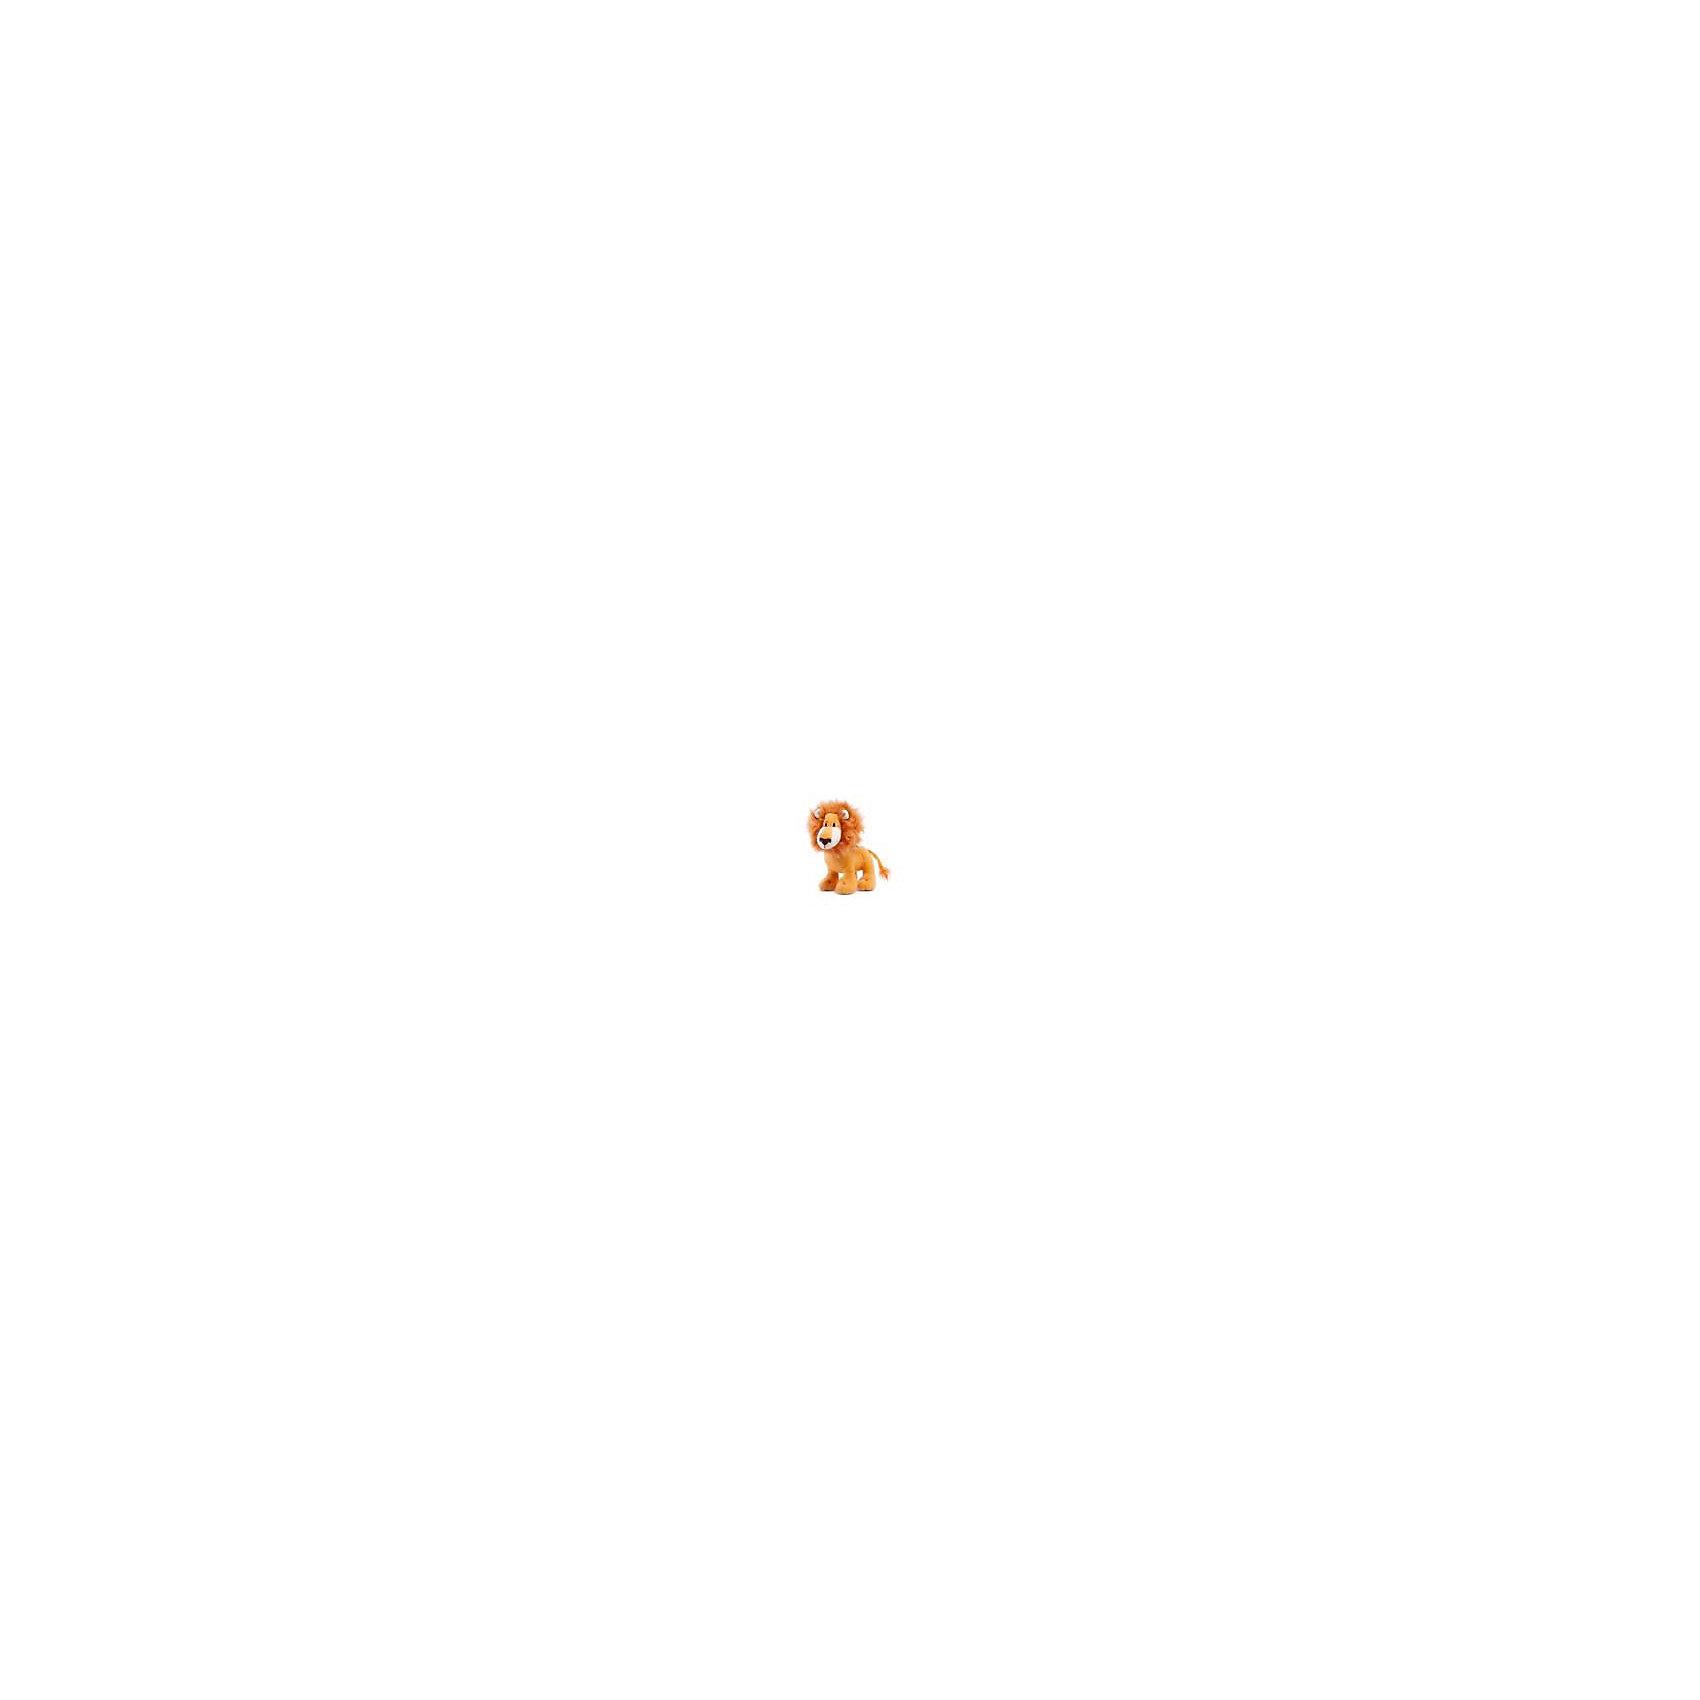 LAVA Лев Рони, музыкальный, LAVA lava жирафик музыкальный 31см lava